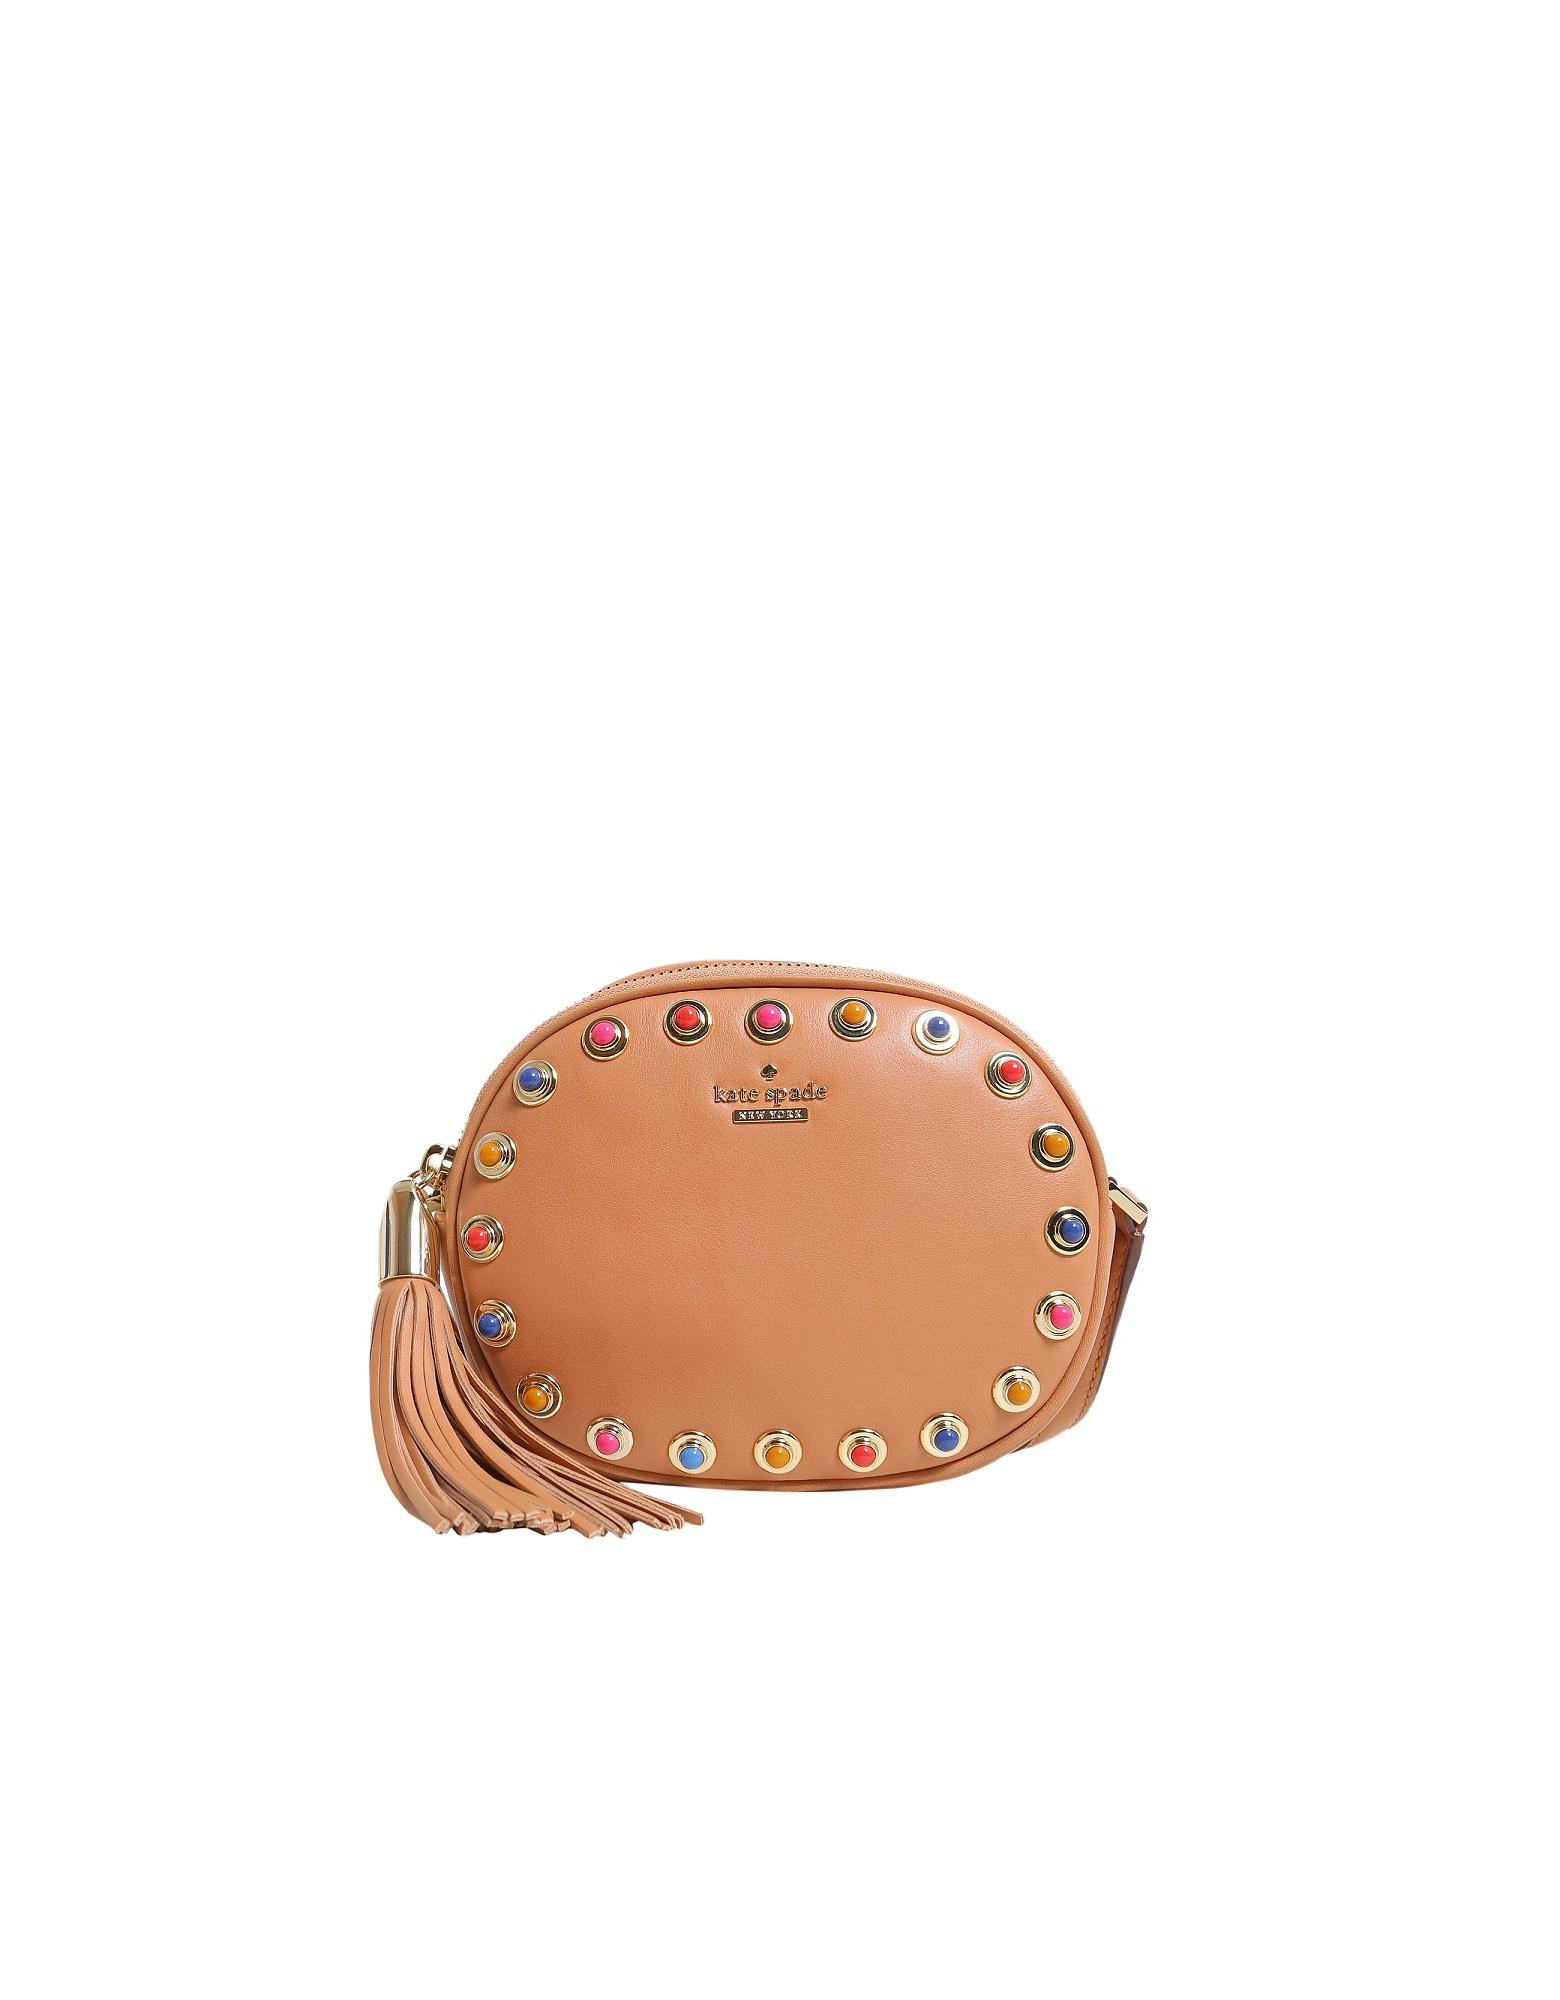 Kate Spade New York Designer Handbags, Canteen Devoe Street Tinley Bag